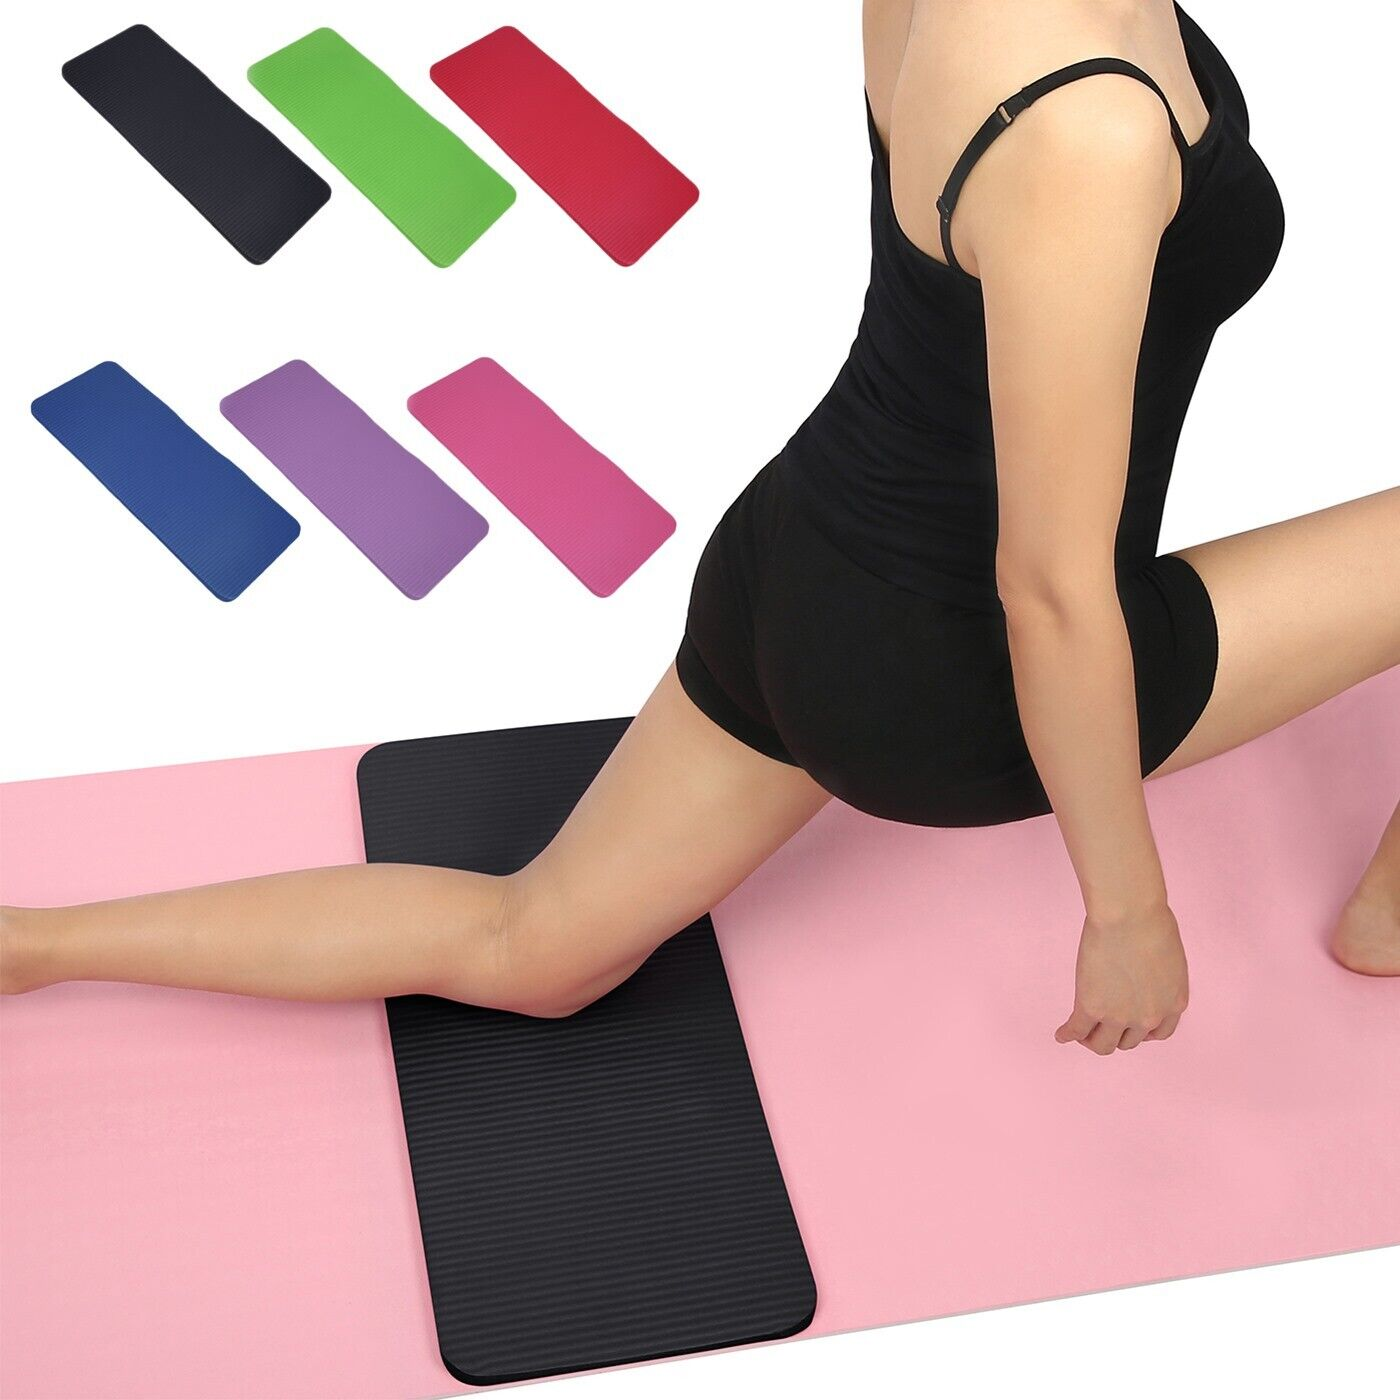 Yoga Knee Pad Cushion  Anti-Slip 15mm Thick Workout Exercise